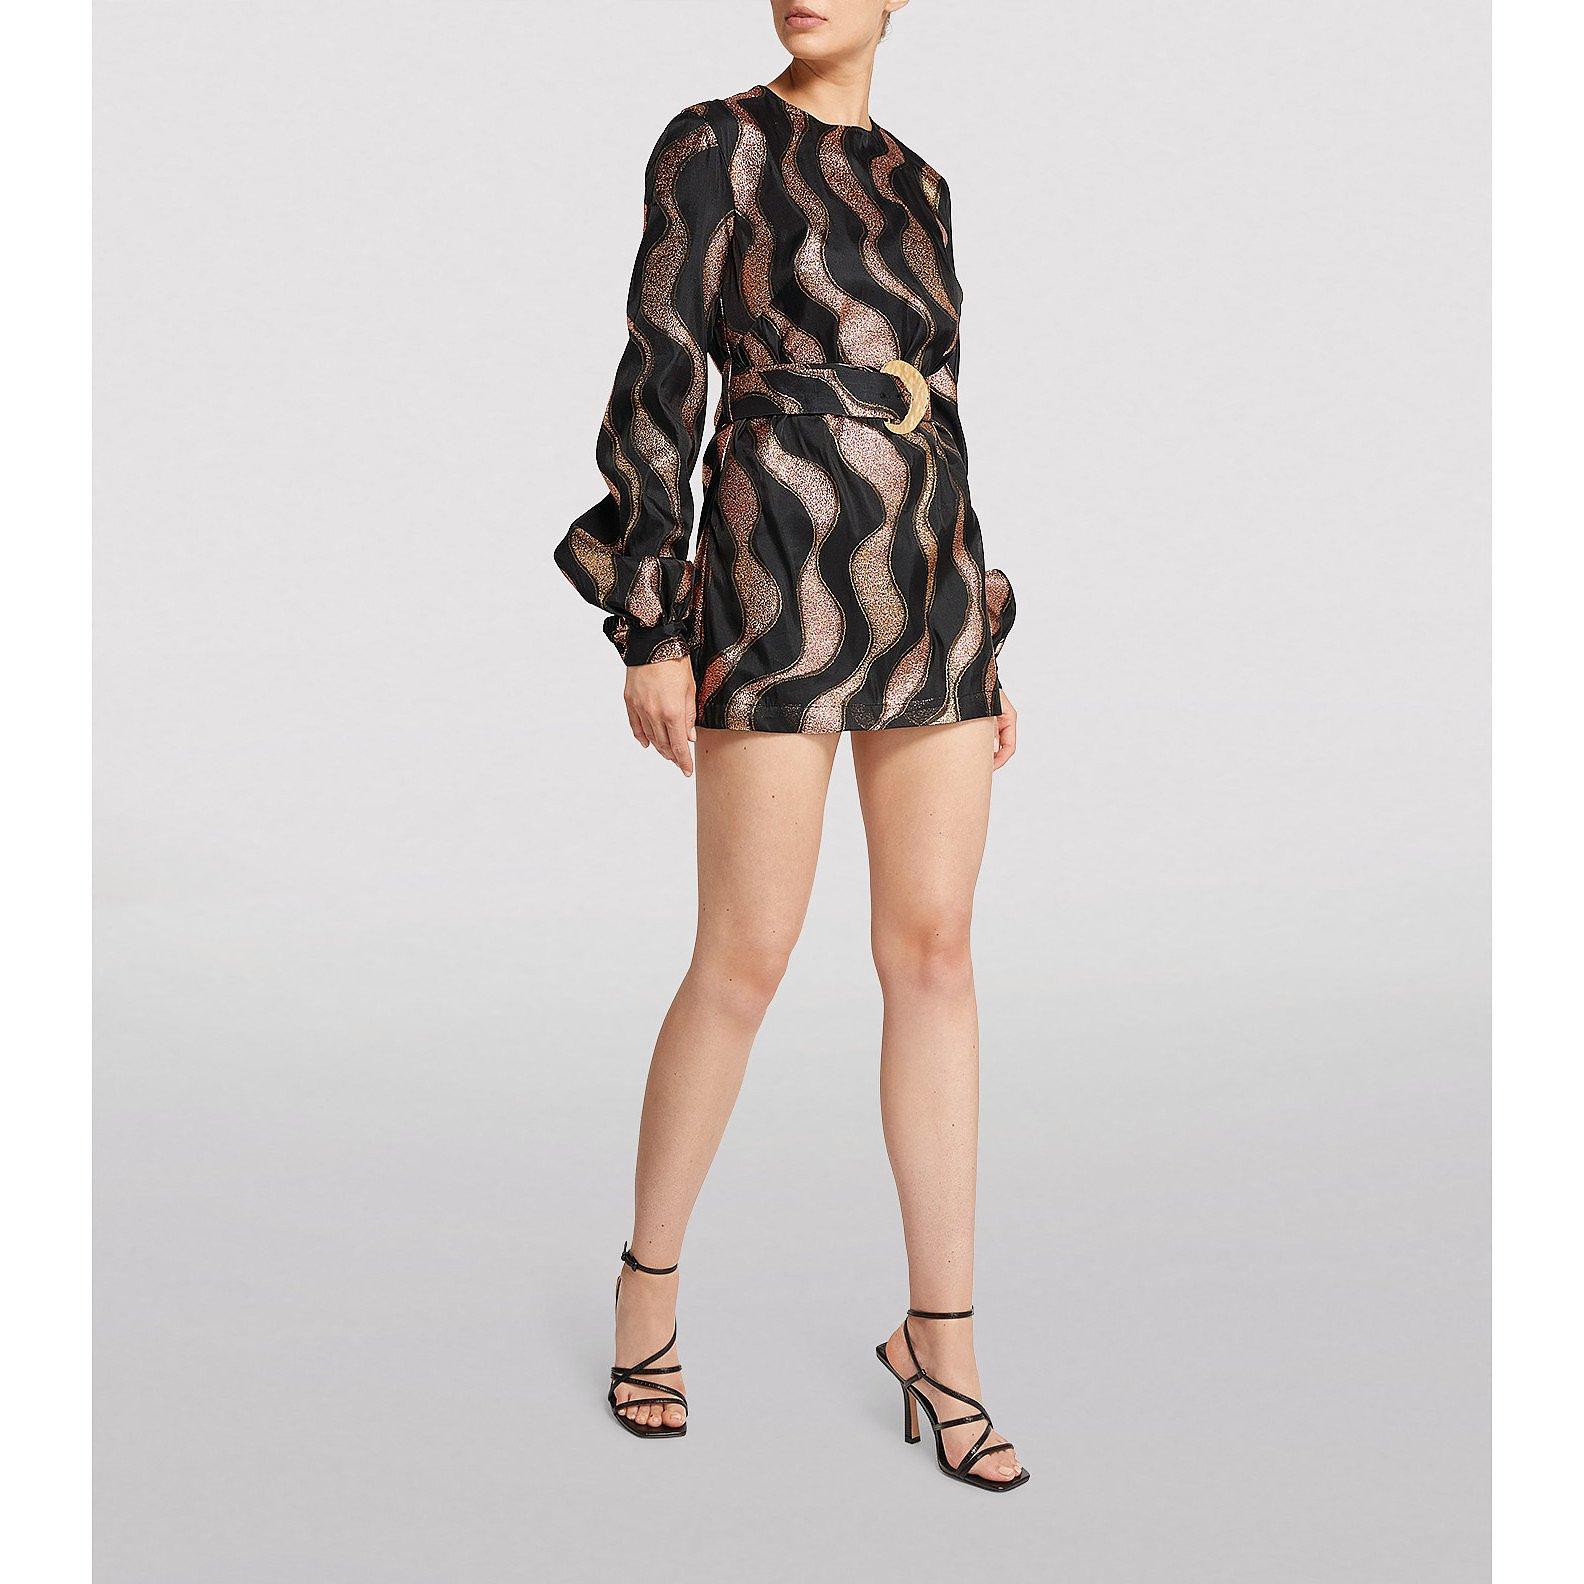 Taller Marmo Metallic Belted Mini Dress